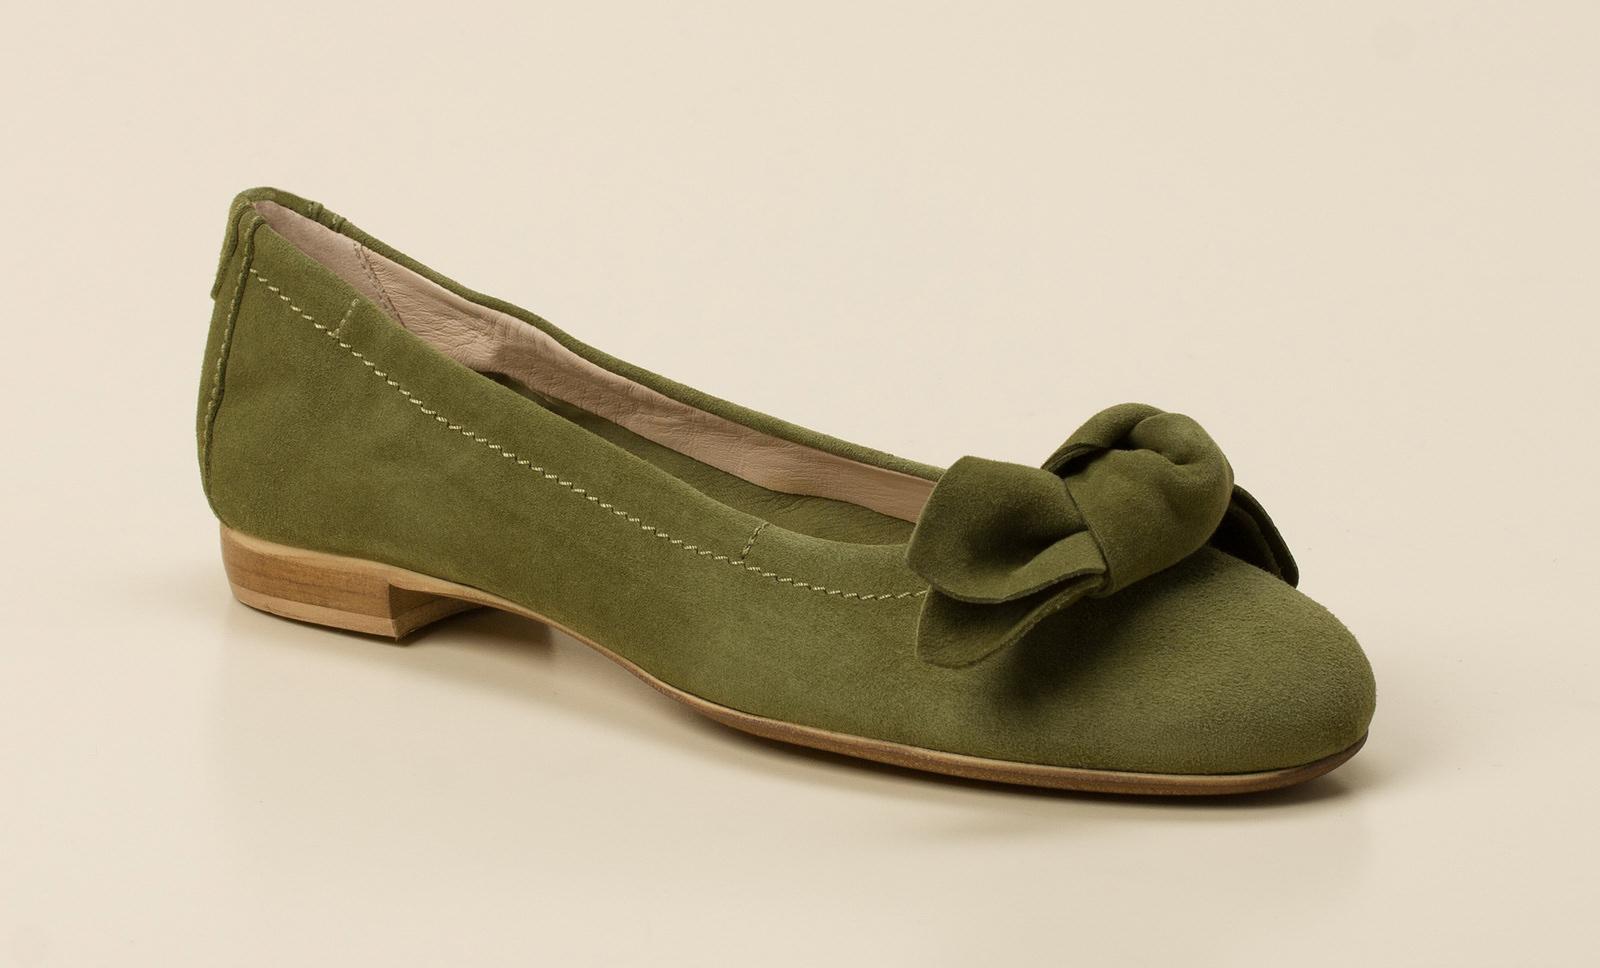 Donna Carolina Damen Ballerina in khaki oliv kaufen   Zumnorde ... 1749f123be